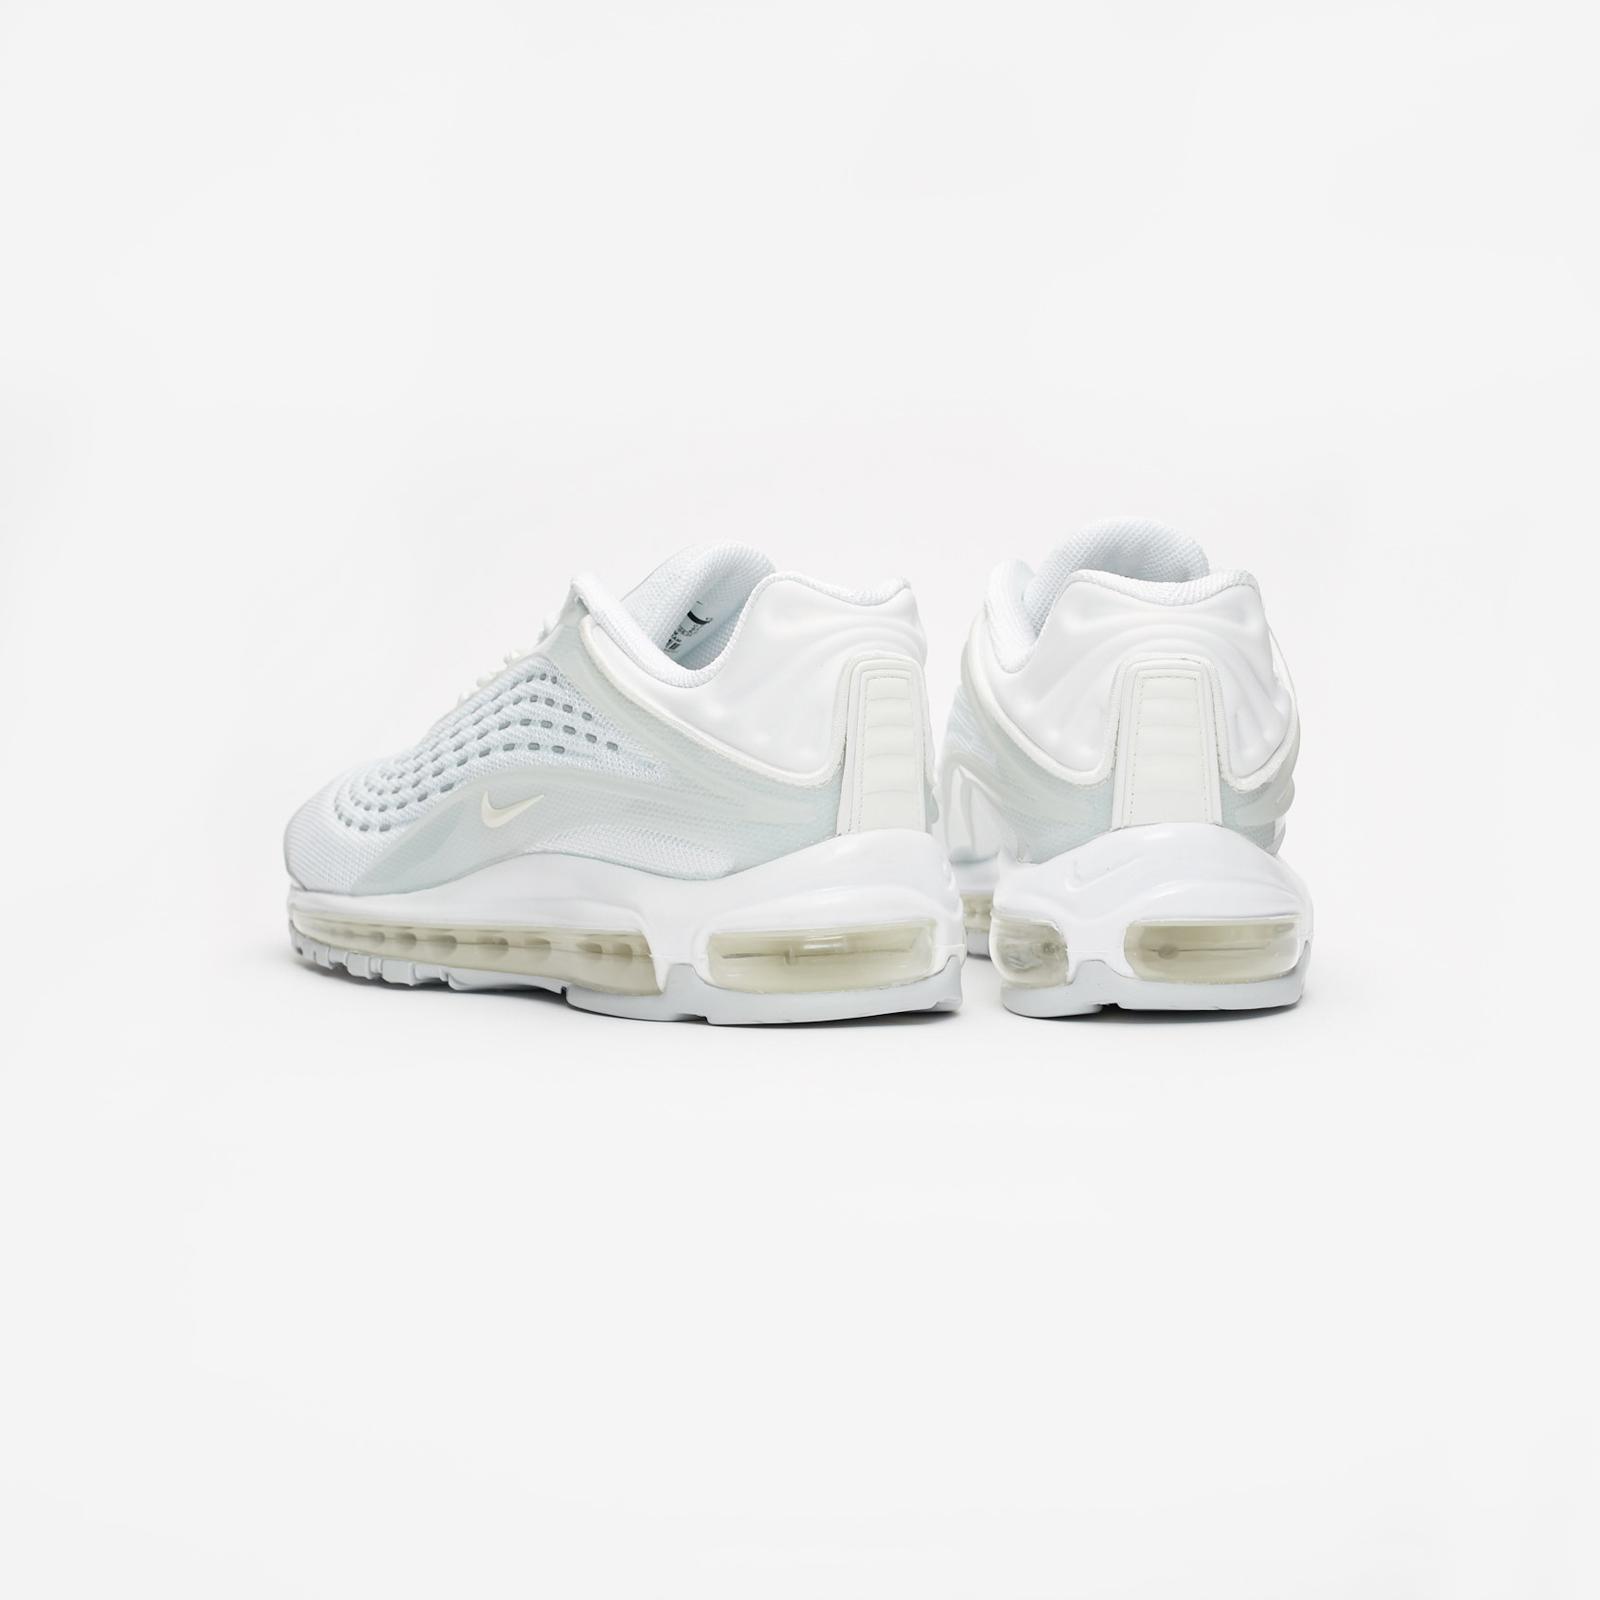 24491d6cd8 Nike Air Max Deluxe - Av2589-100 - Sneakersnstuff | sneakers & streetwear  på nätet sen 1999